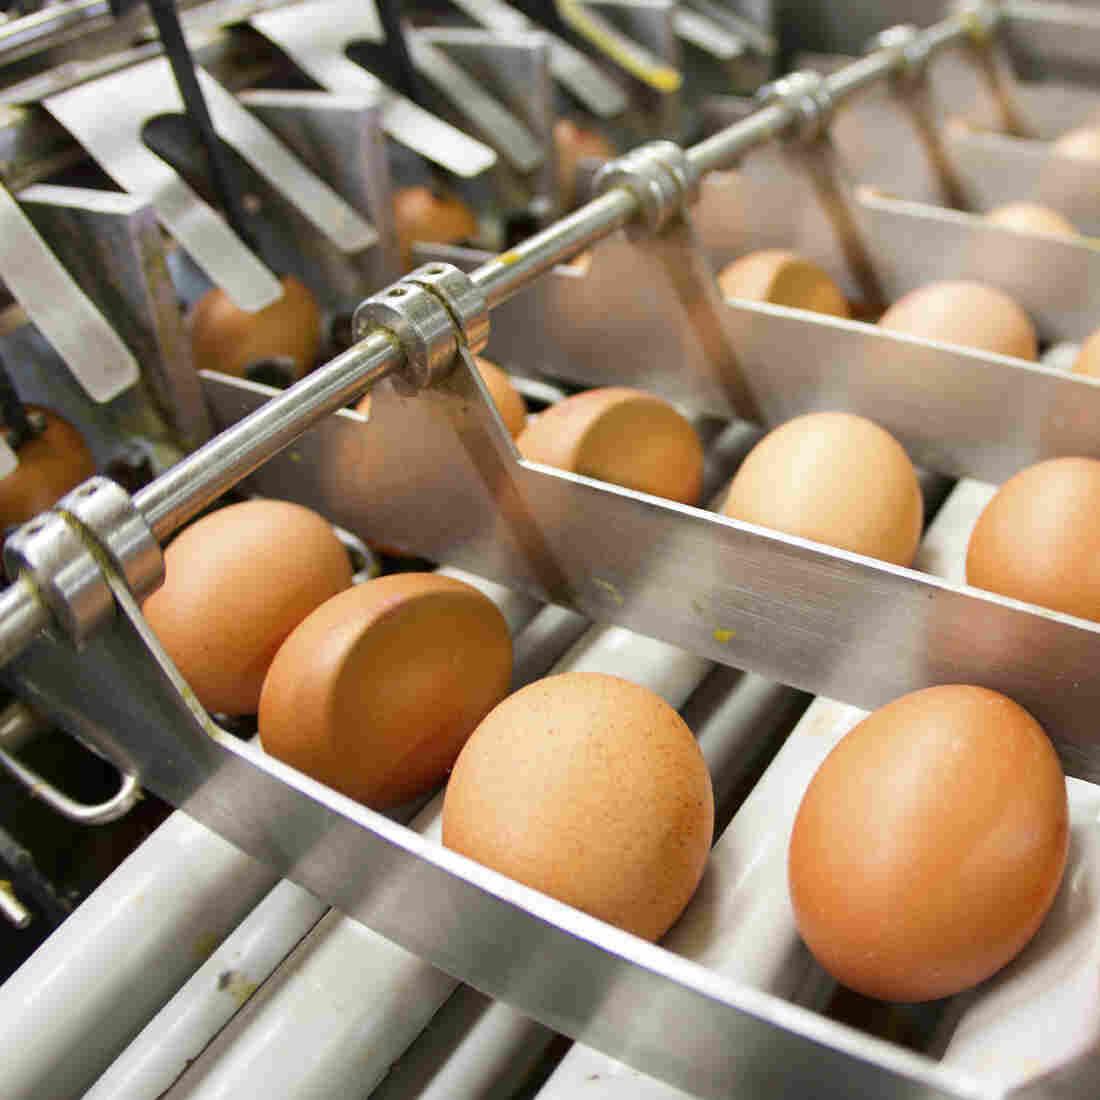 Avian Flu Outbreak Has U.S. Bakers Begging For Europe's Eggs